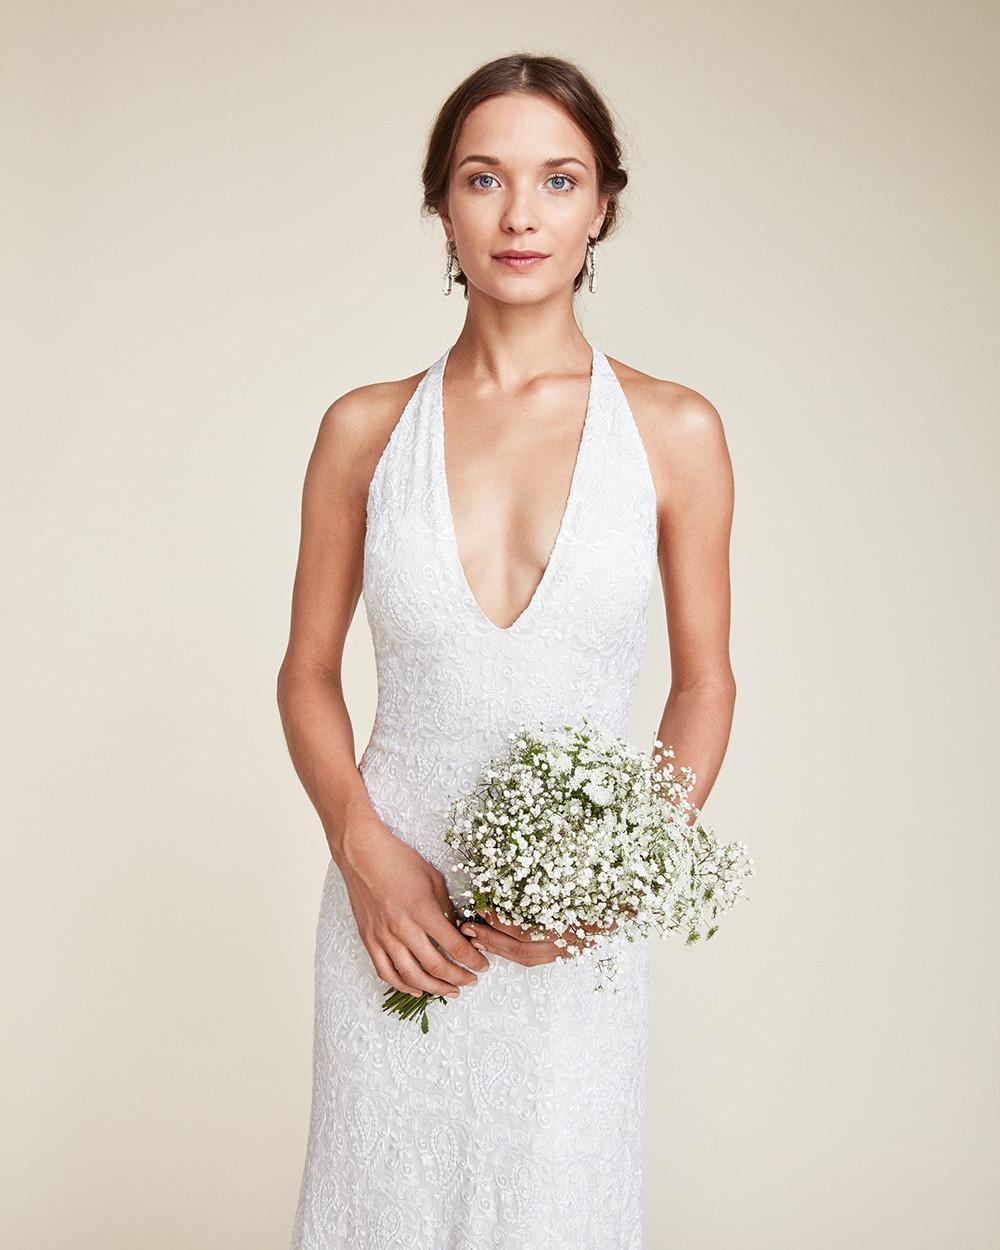 Lyst - Nicole Miller Sophia Bridal Gown in White